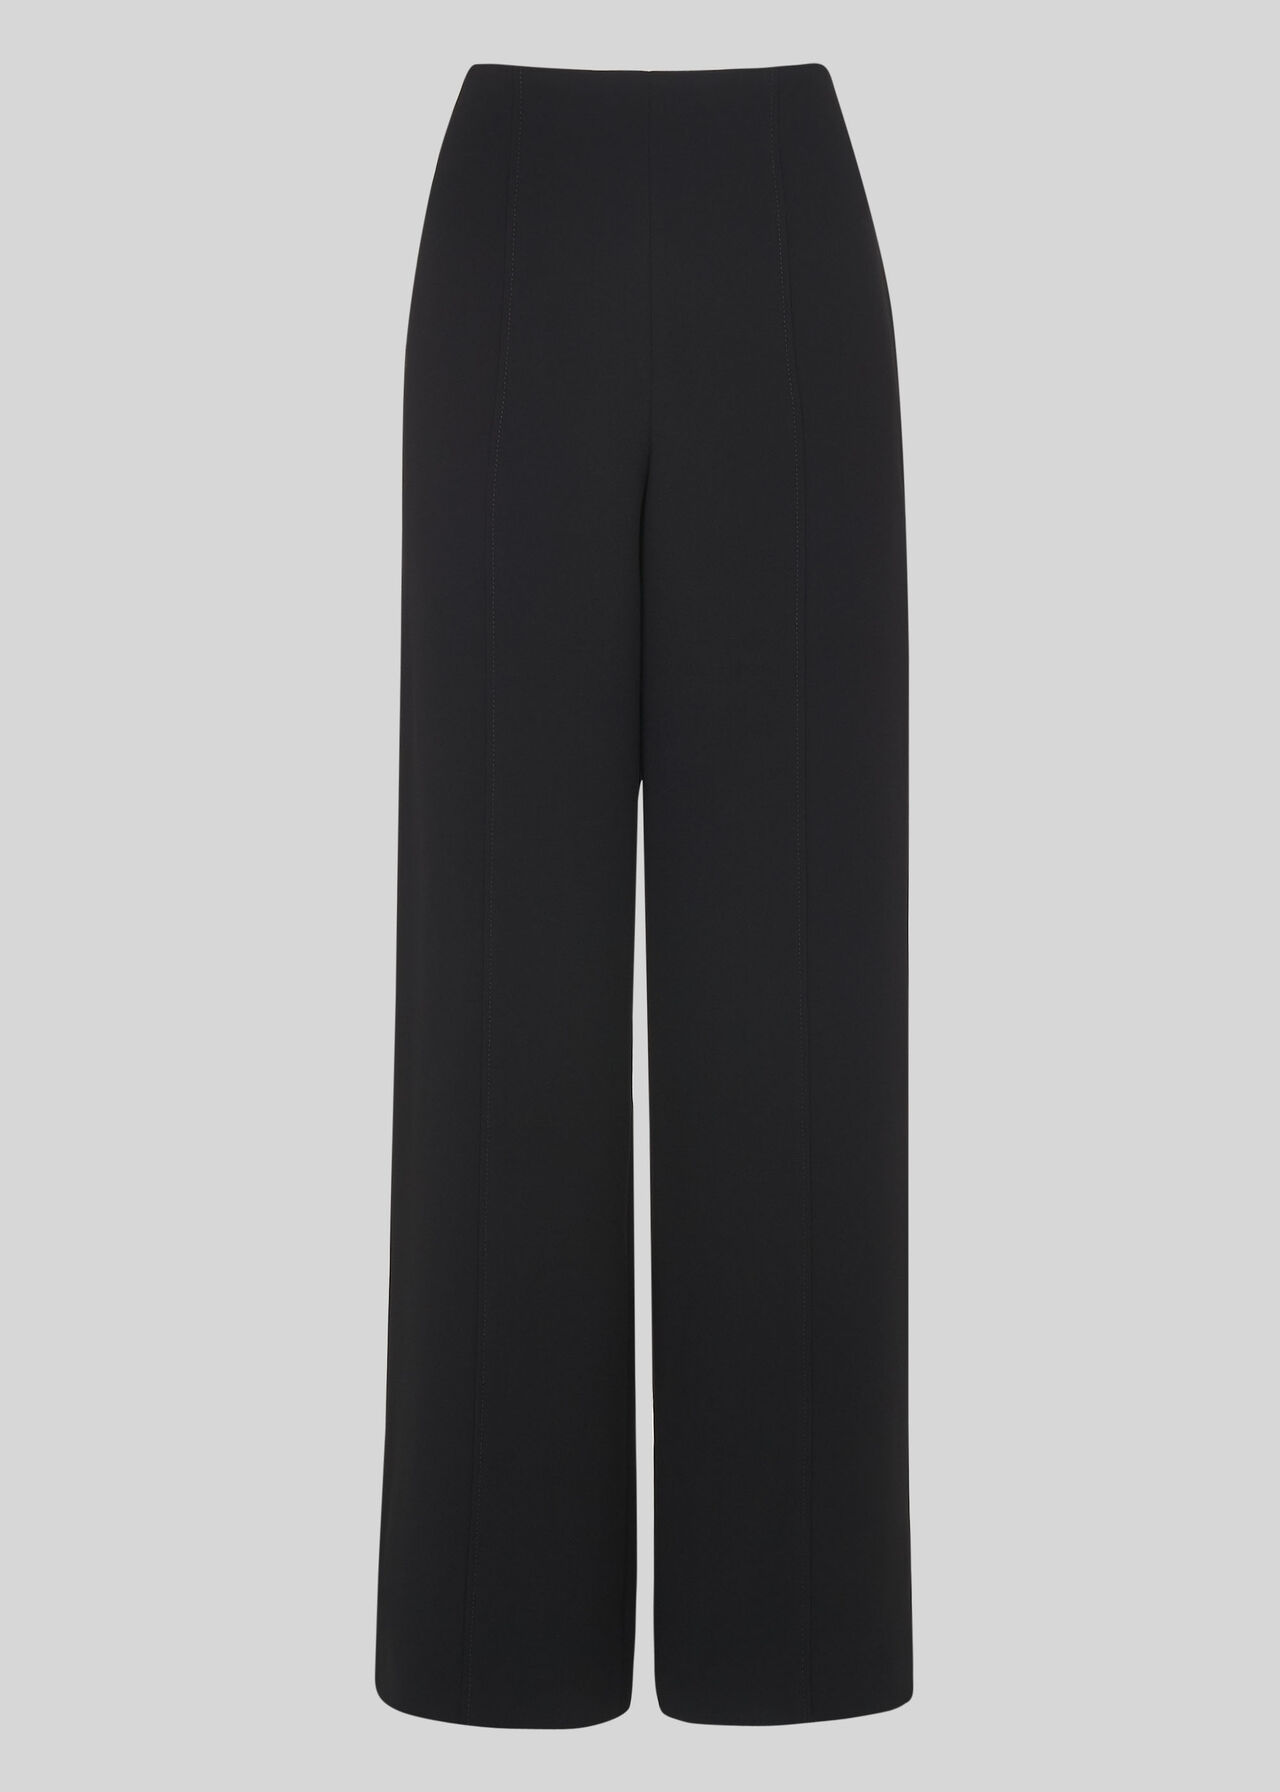 Wide Leg Crepe Trouser Black